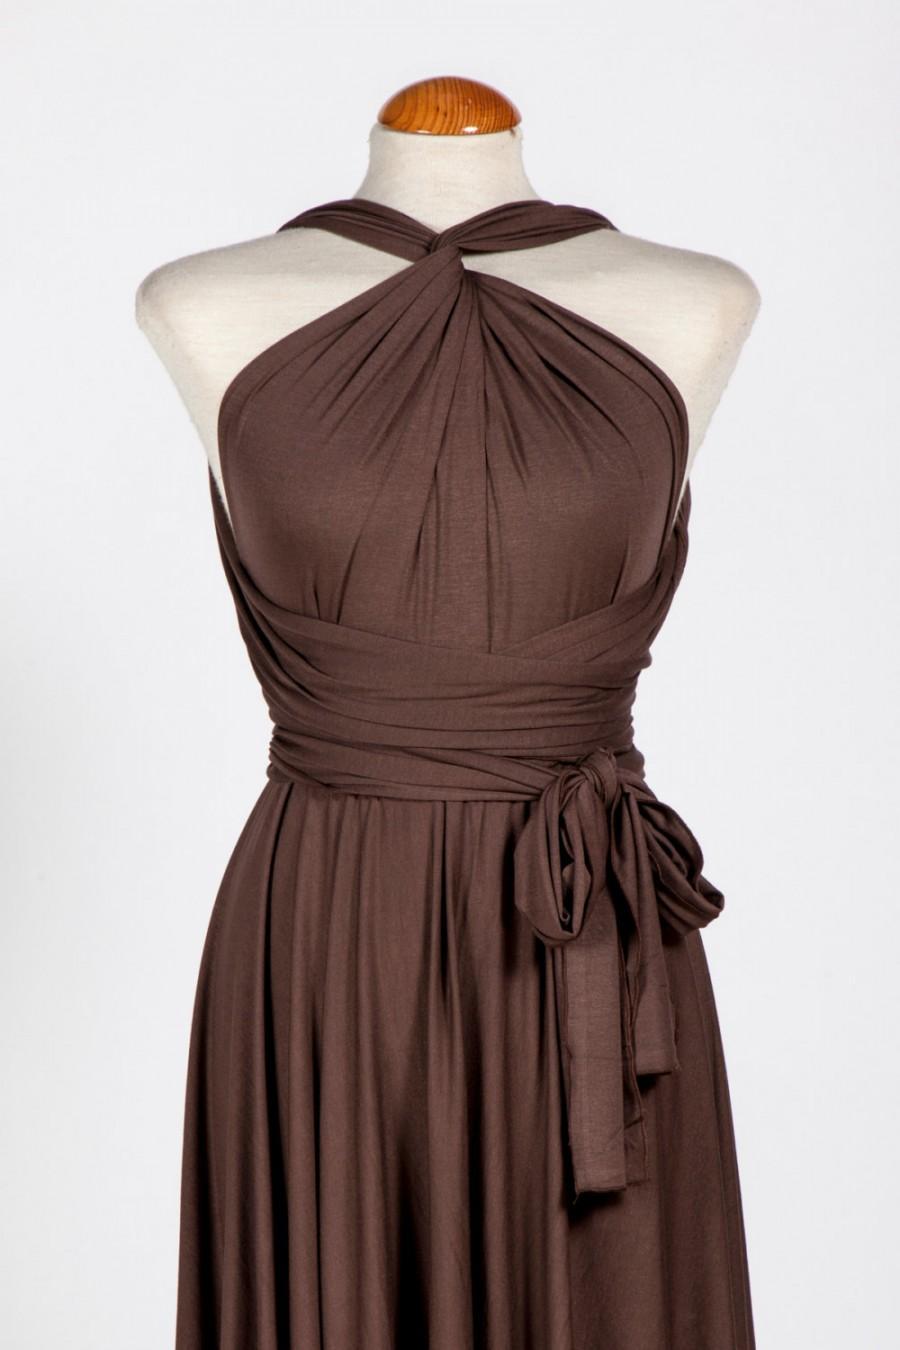 زفاف - Cocoa Braid Dress / Bridesmaid Dress / Dark Cocao Infinity Wrap Dress / Infinity Wrap Dress / Feminine Chocolate Wrap Dress